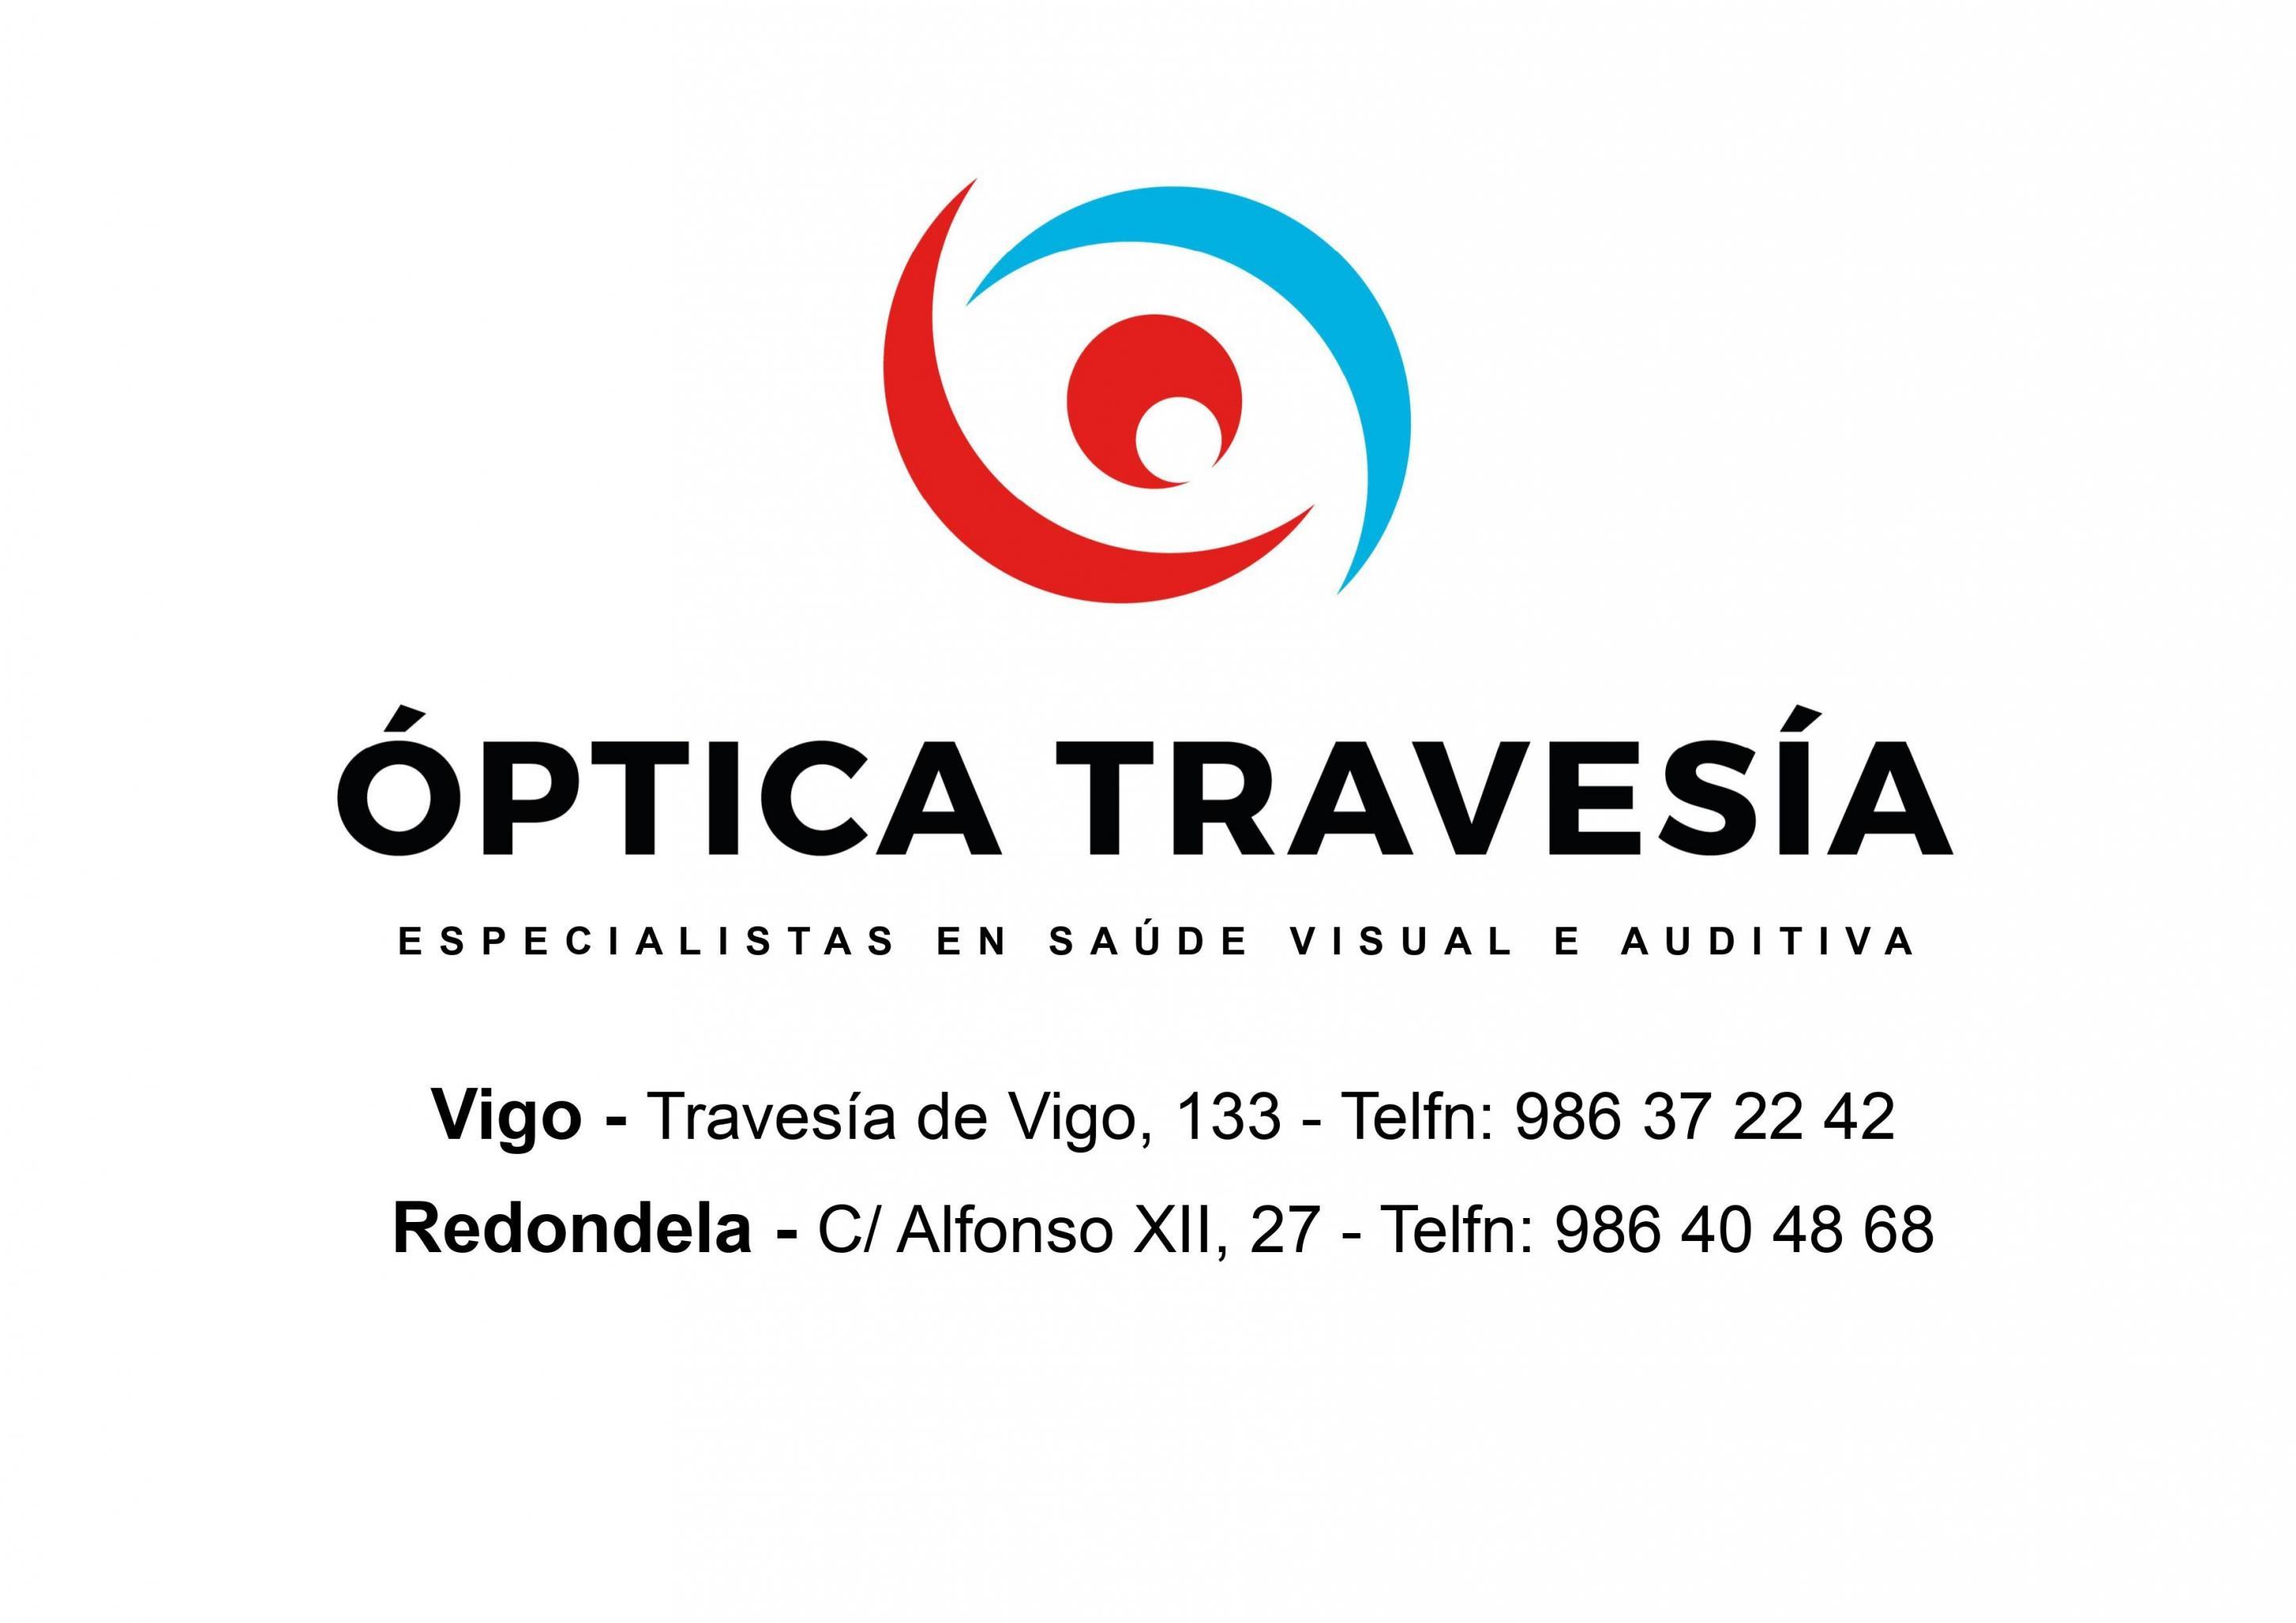 OPTICA TRAVESIA, S.L.